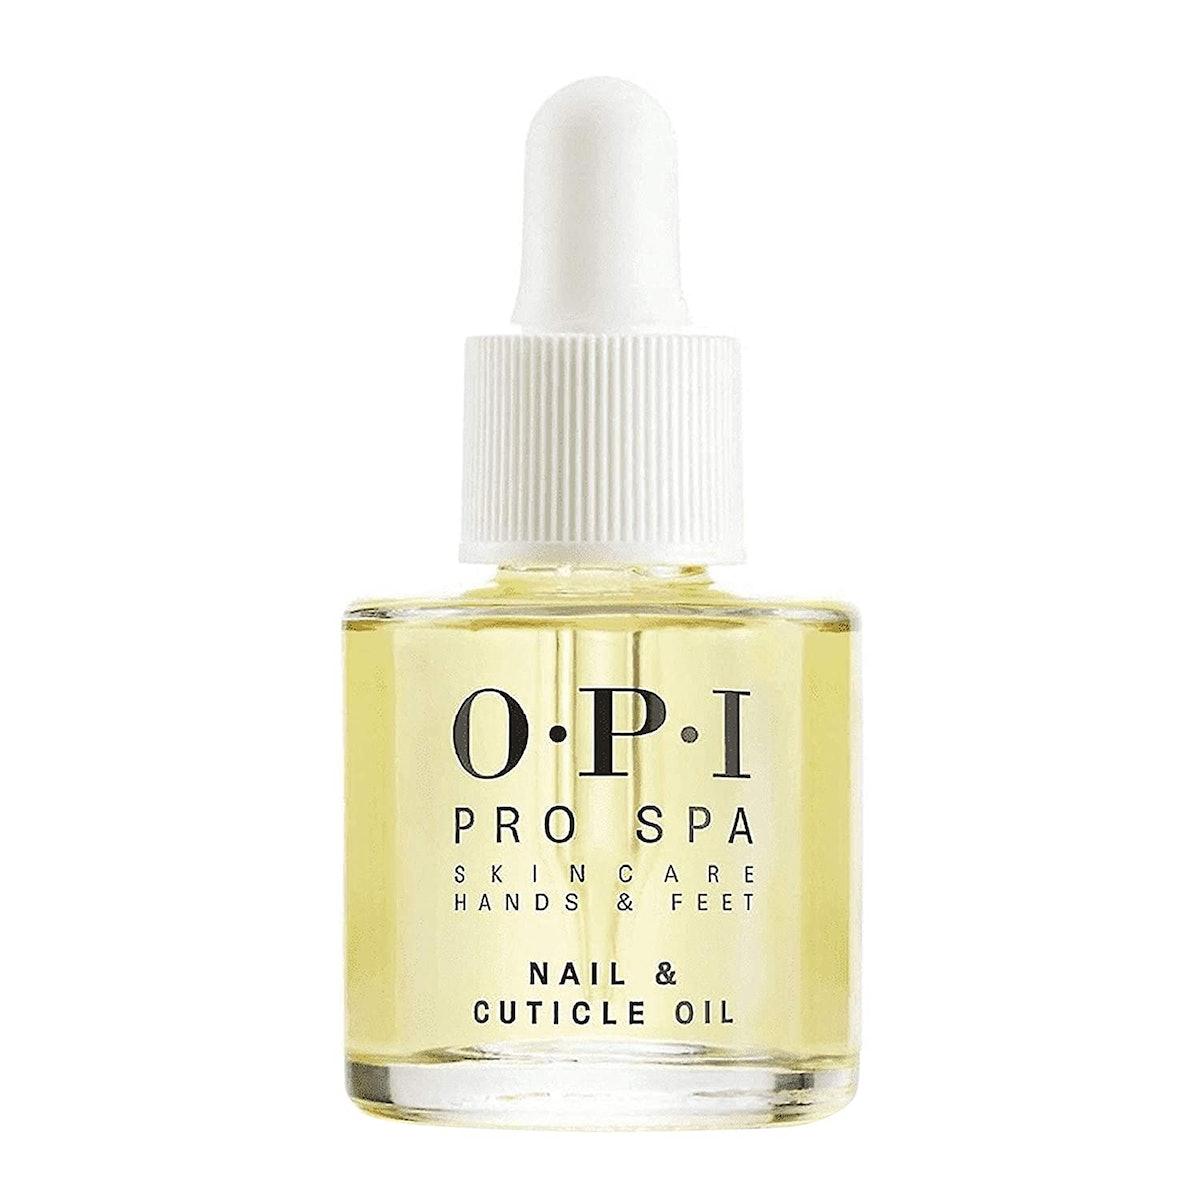 OPI Nail and Cuticle Oil